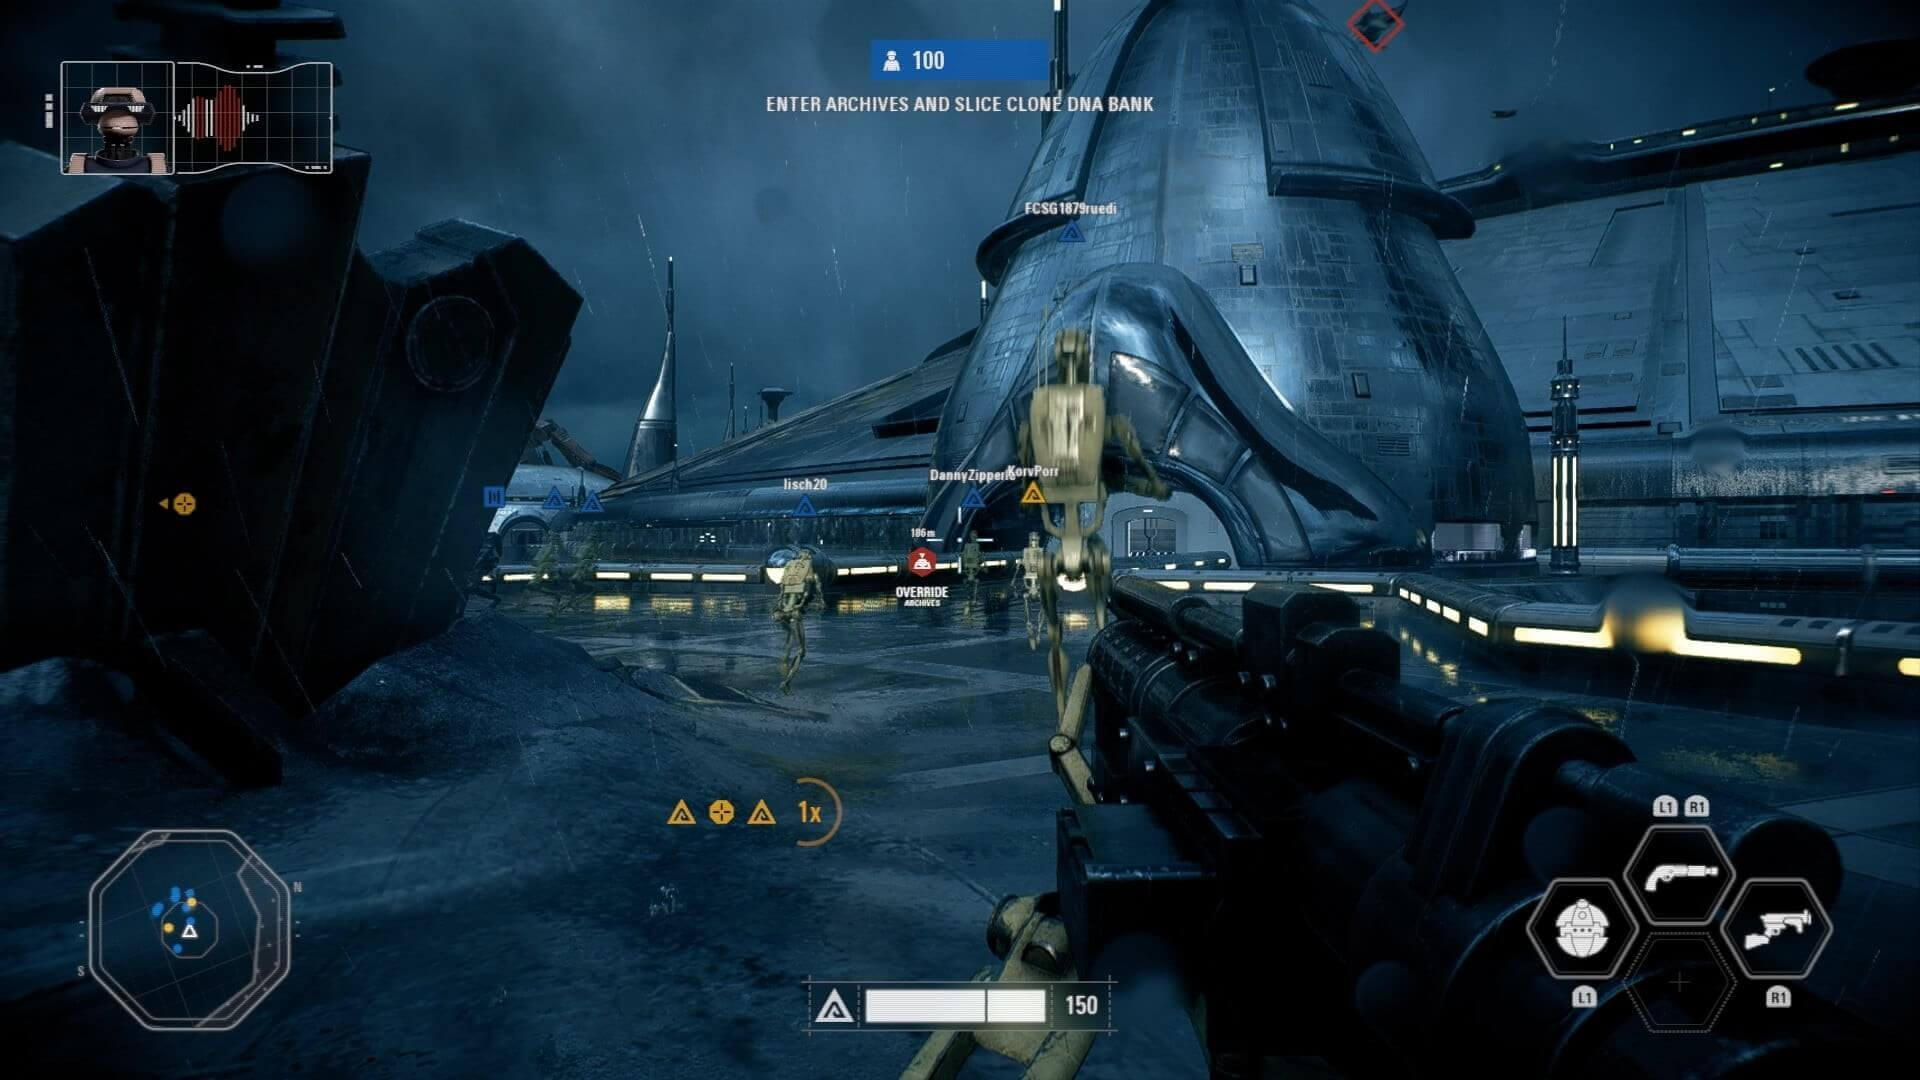 Star Wars: Battlefront II - Deluxe Edition